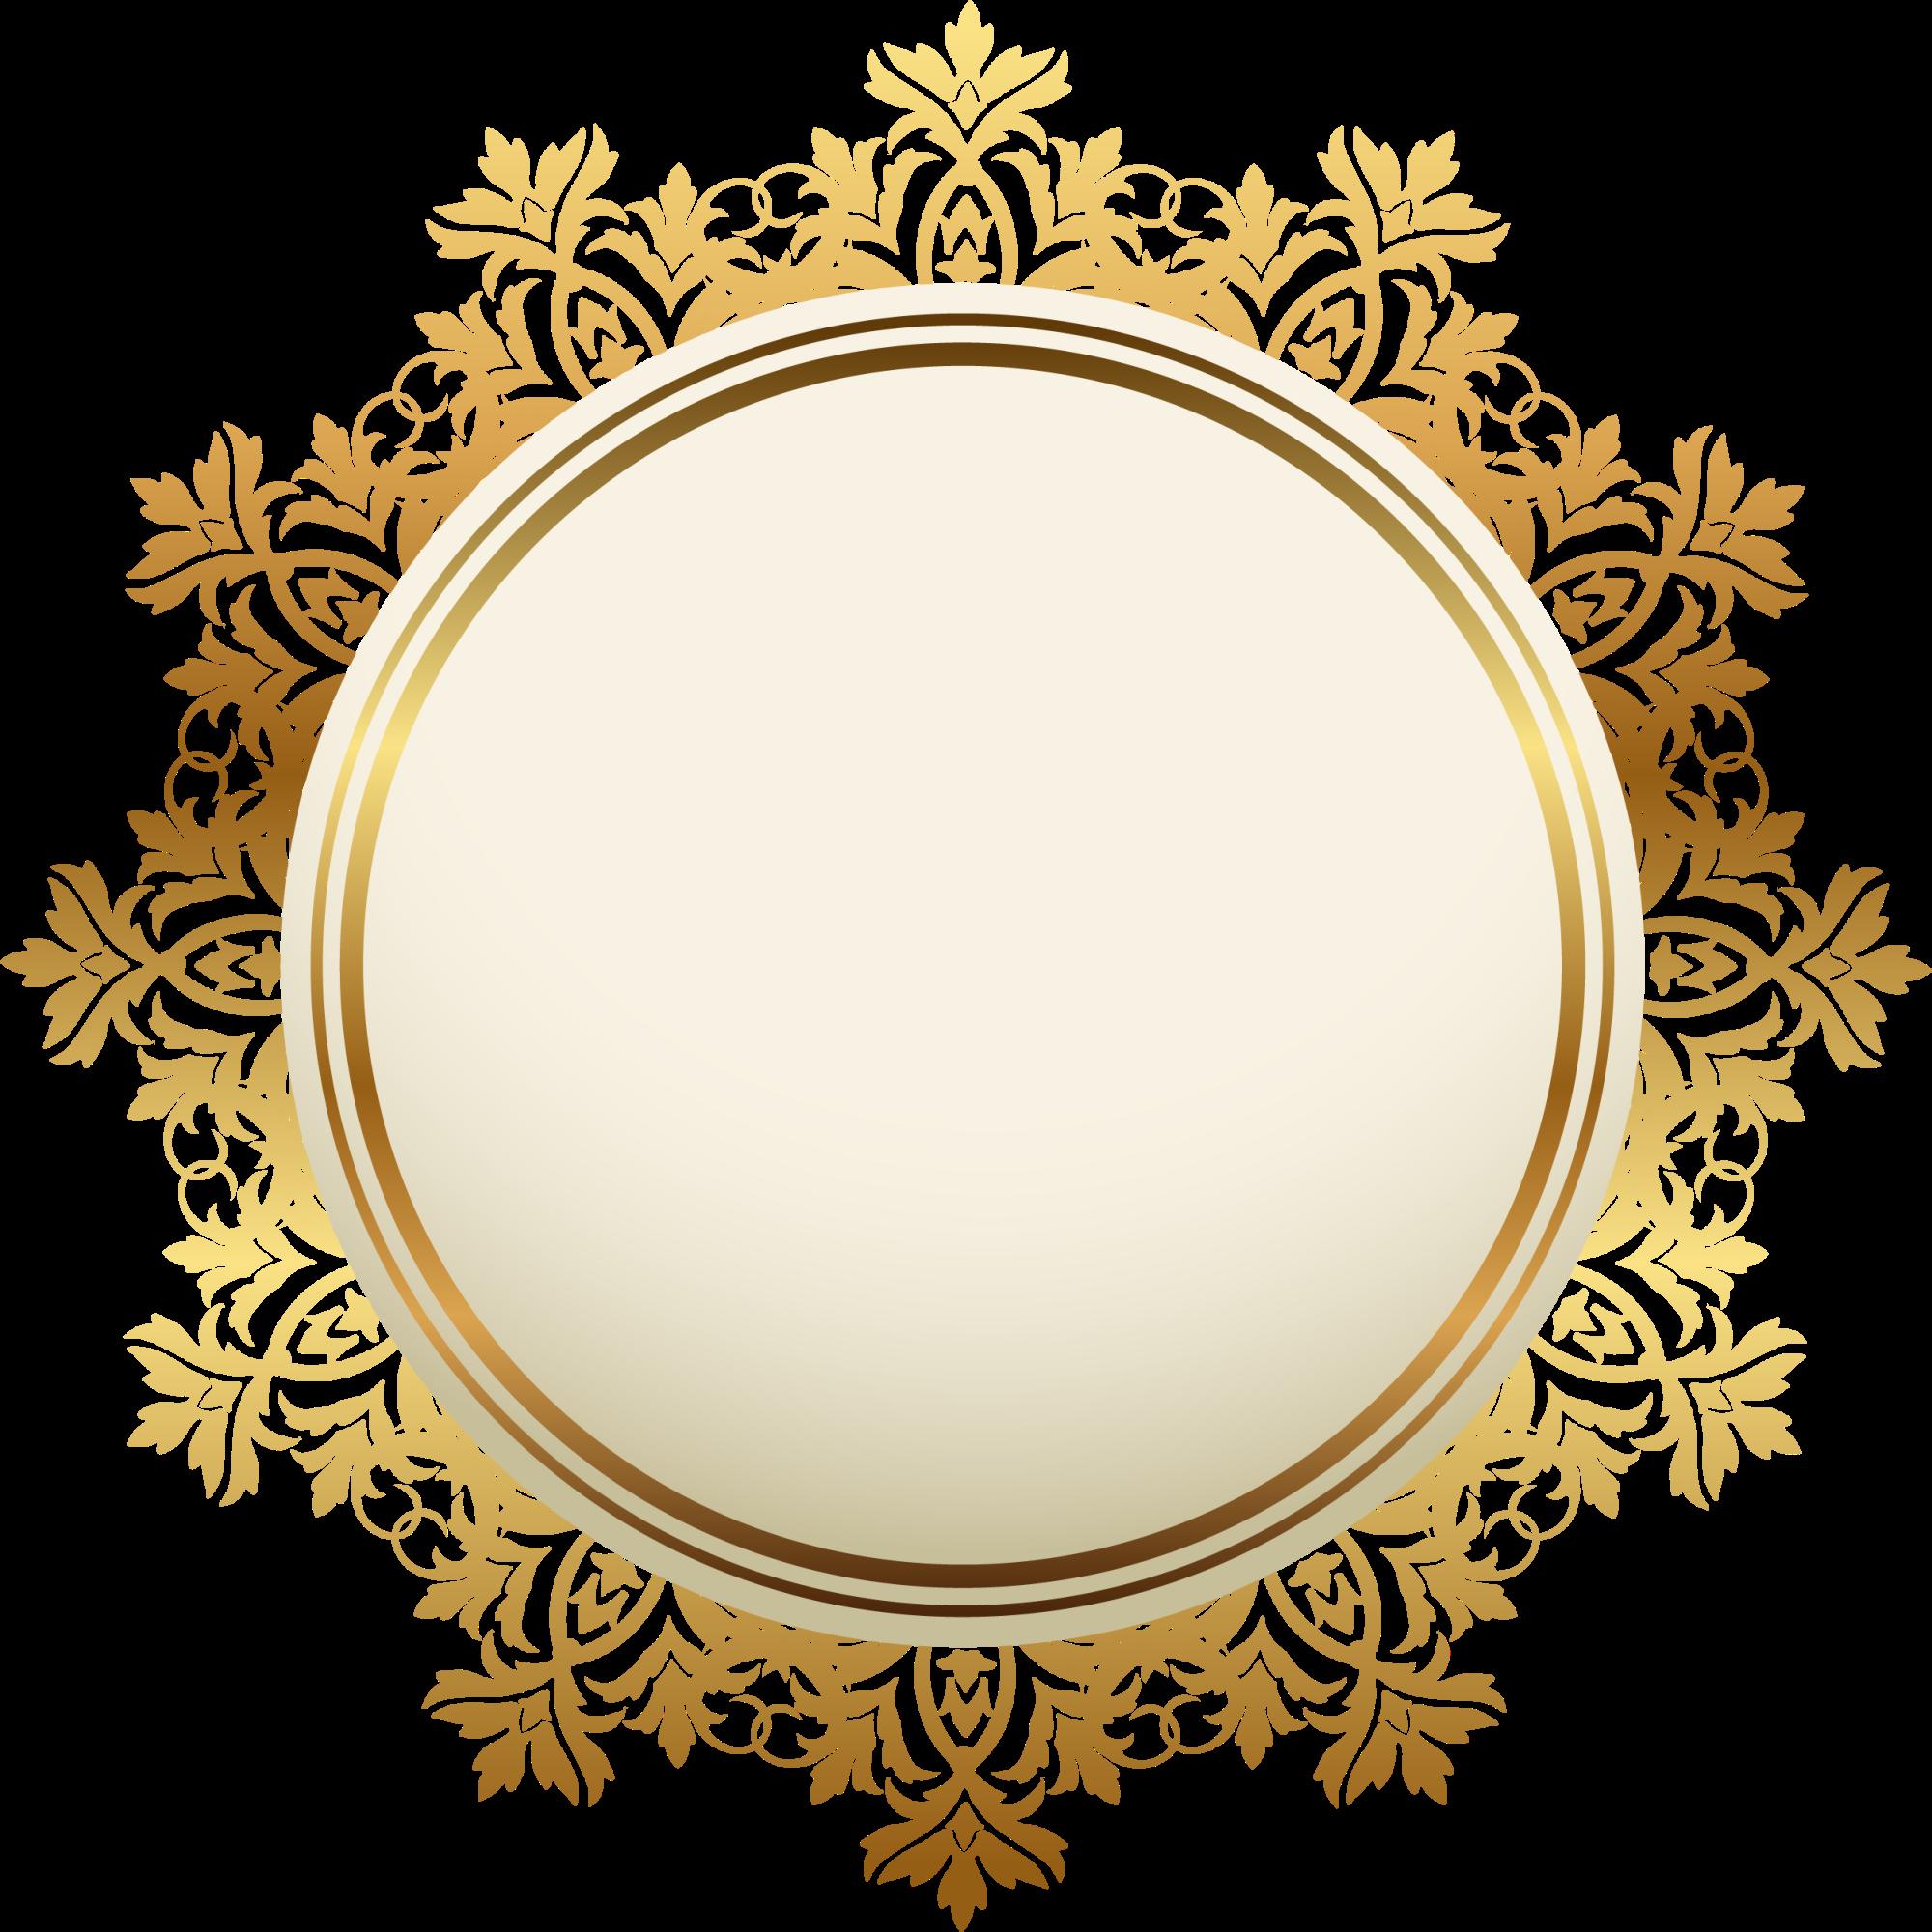 Golden Badge PNG Background Image PNG Arts 2000x2000